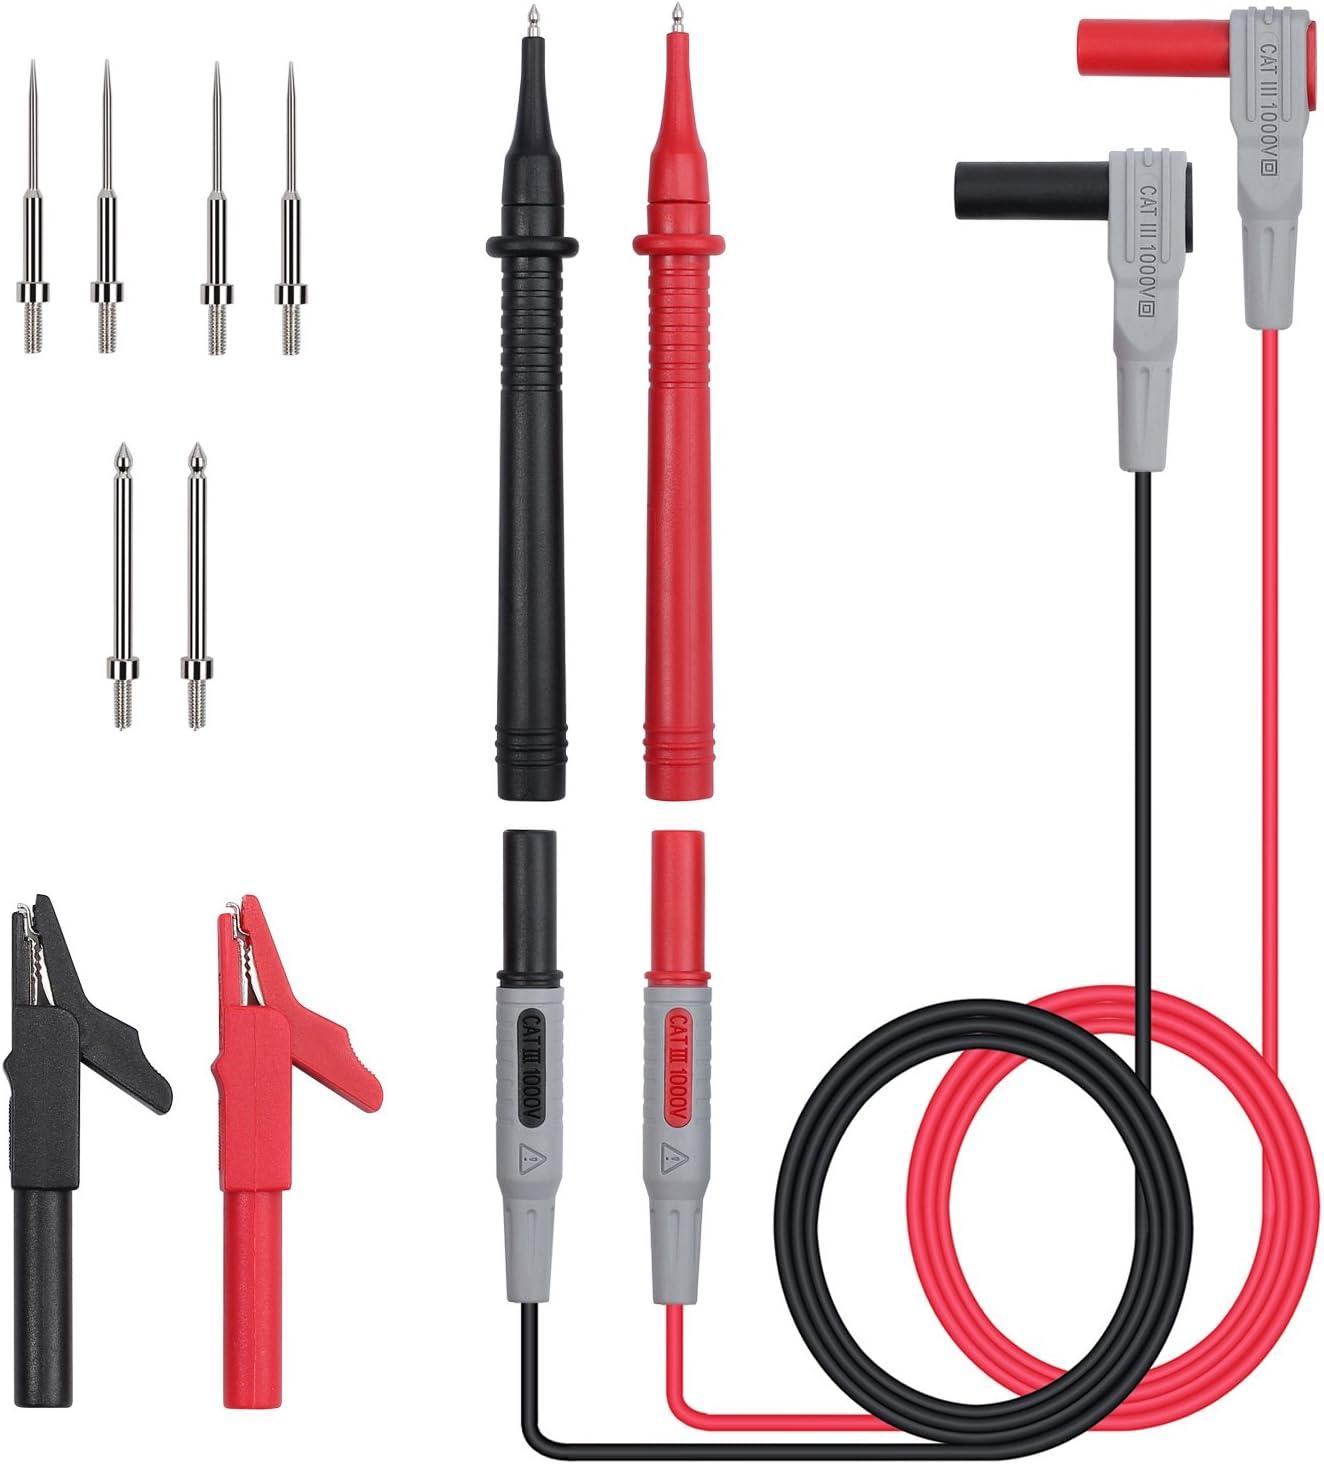 Details about  /Sumnacon 10 Pcs Multimeter Electrical Test Dual Lead Hook Clips 5 Colors To